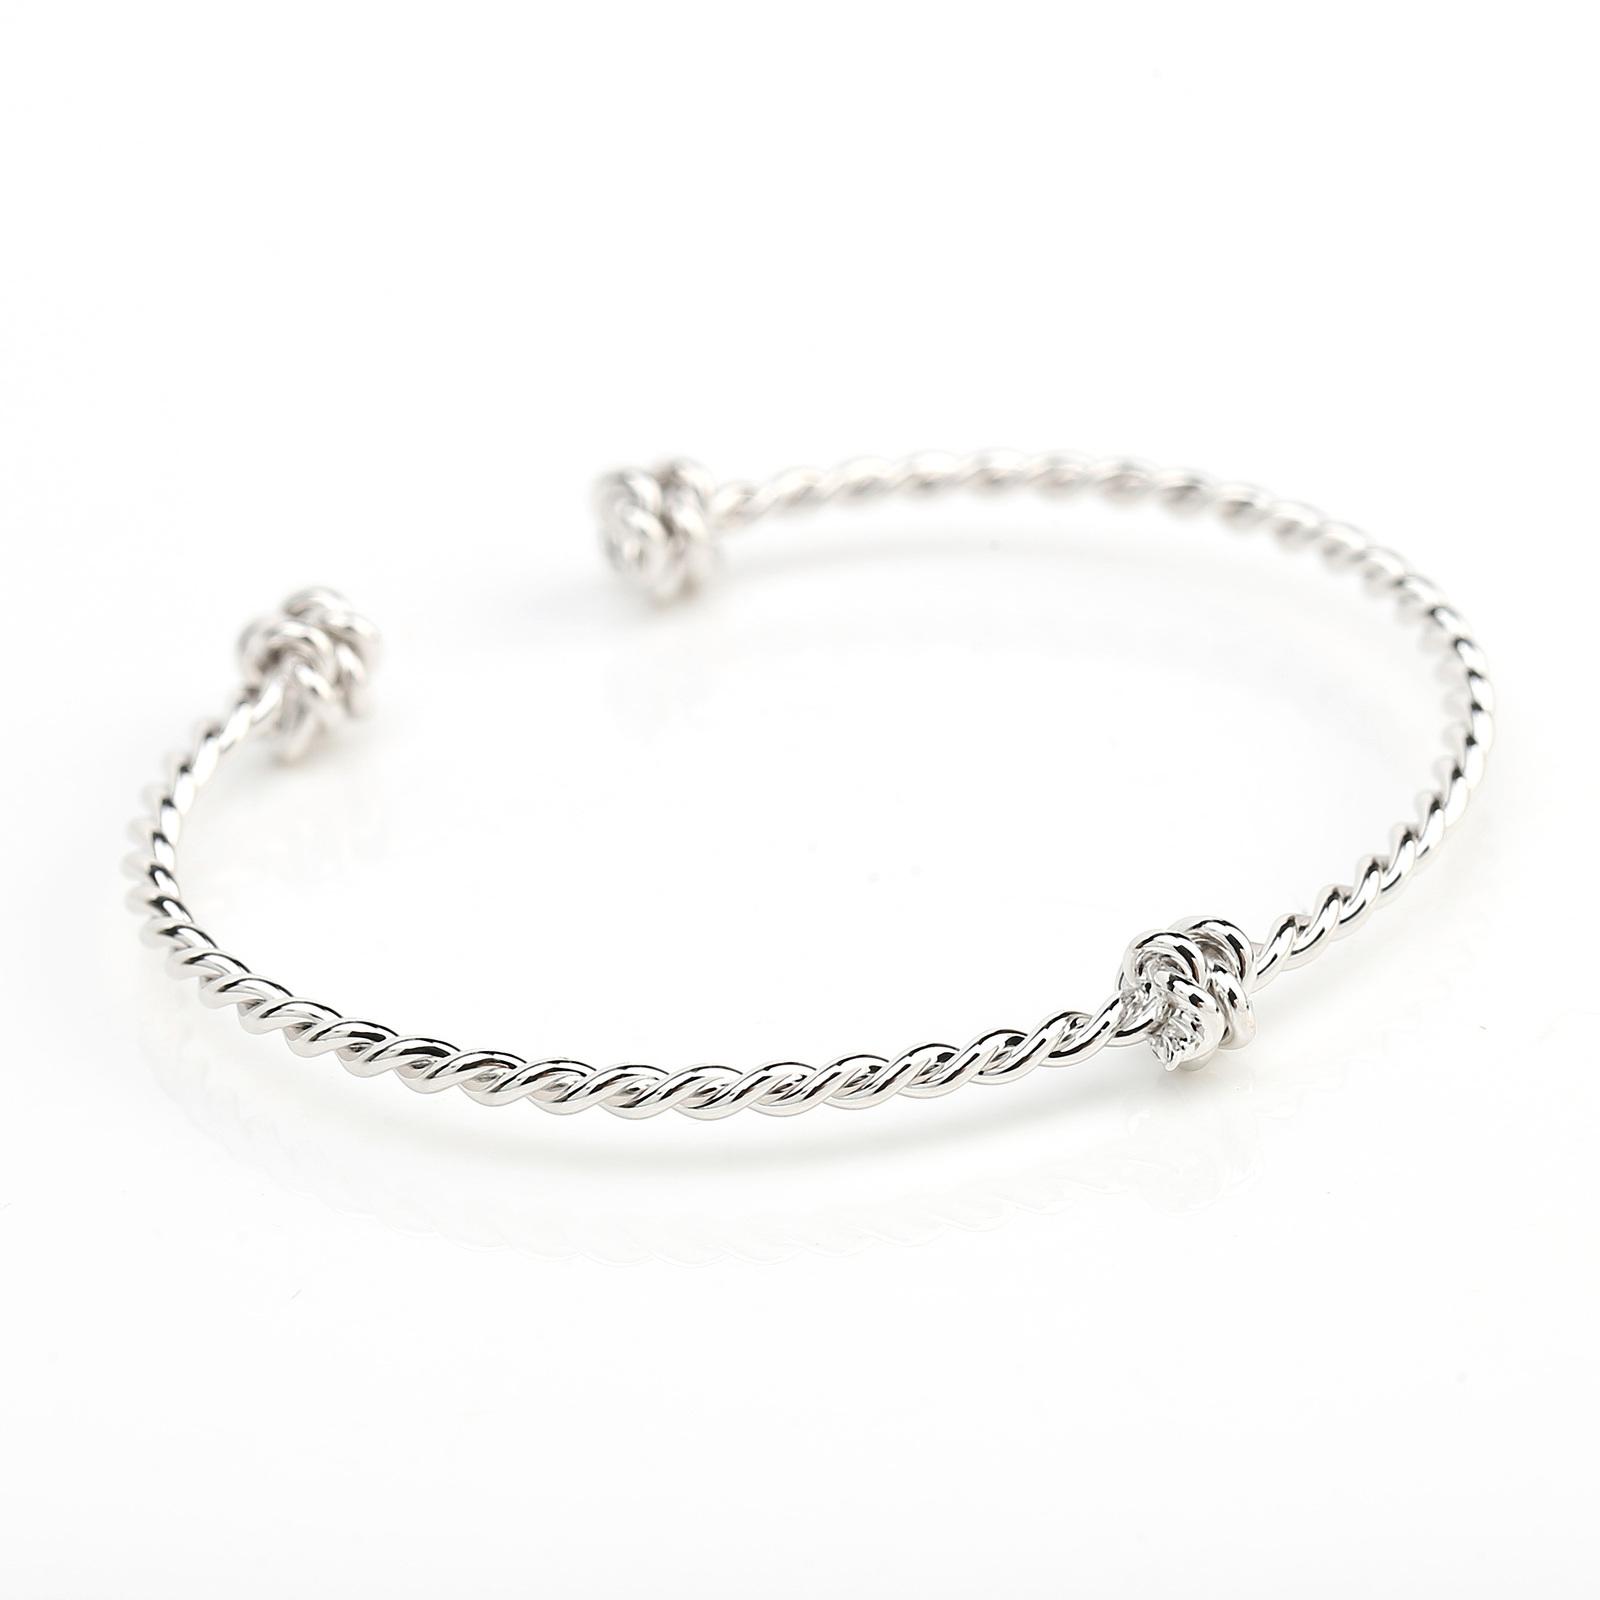 UE- Stylish Silver Tone Designer Twisted Bangle Bracelet With Trendy Knot Design